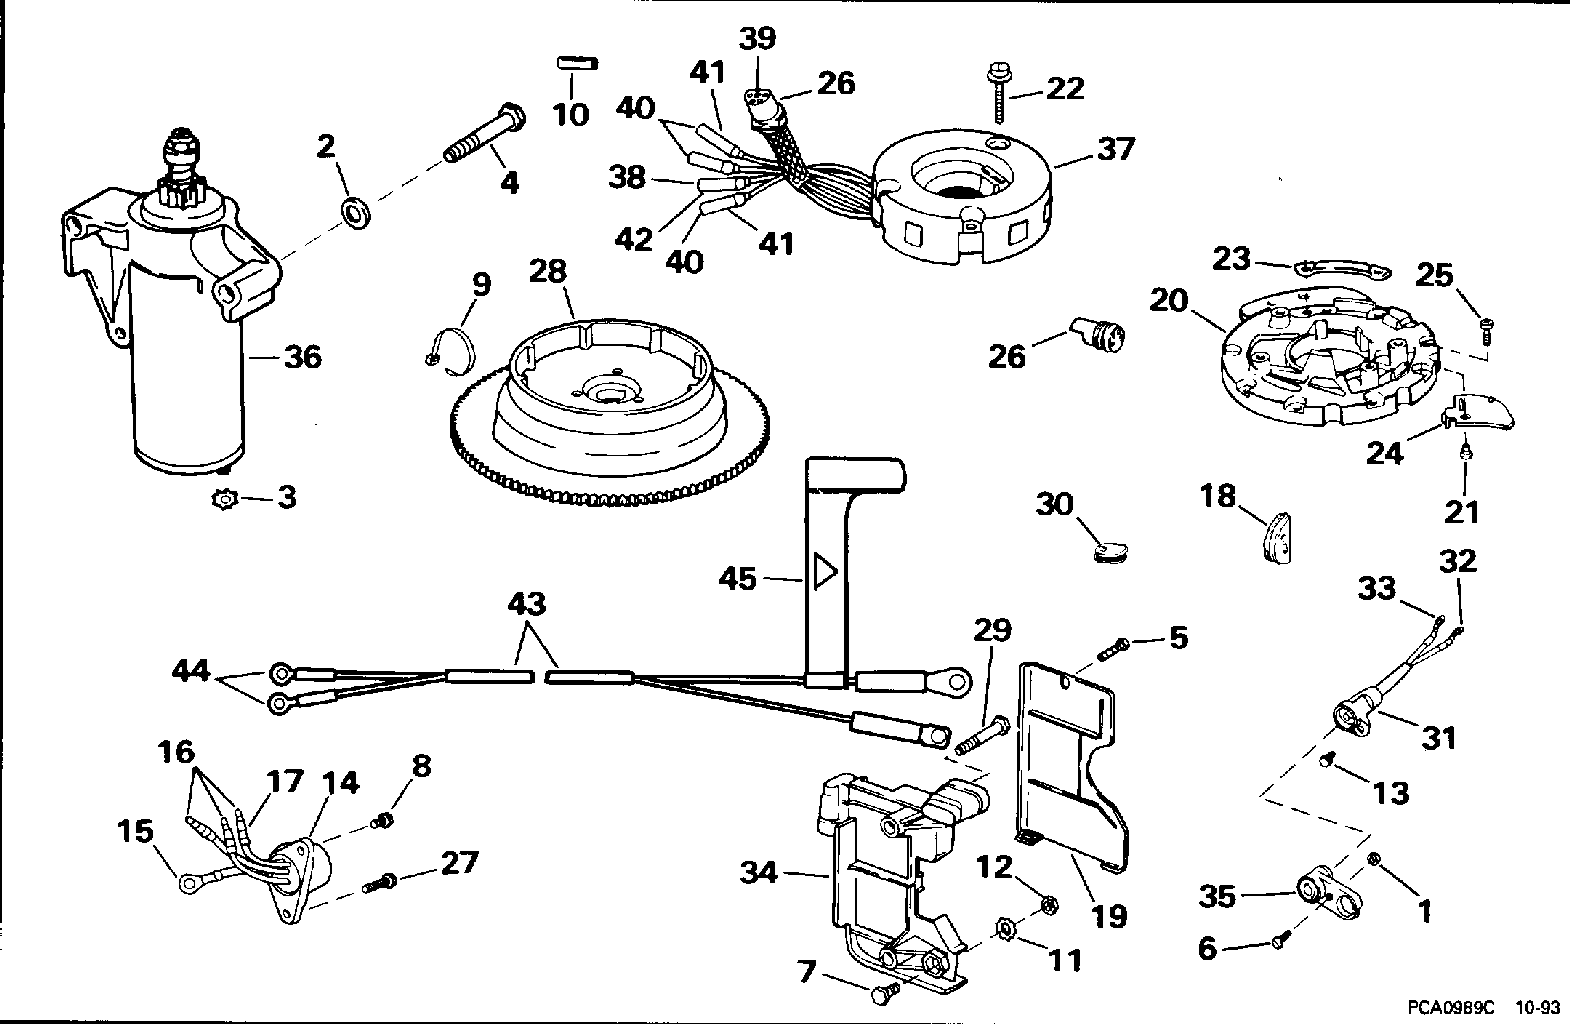 Tiller Electric Starting Kit